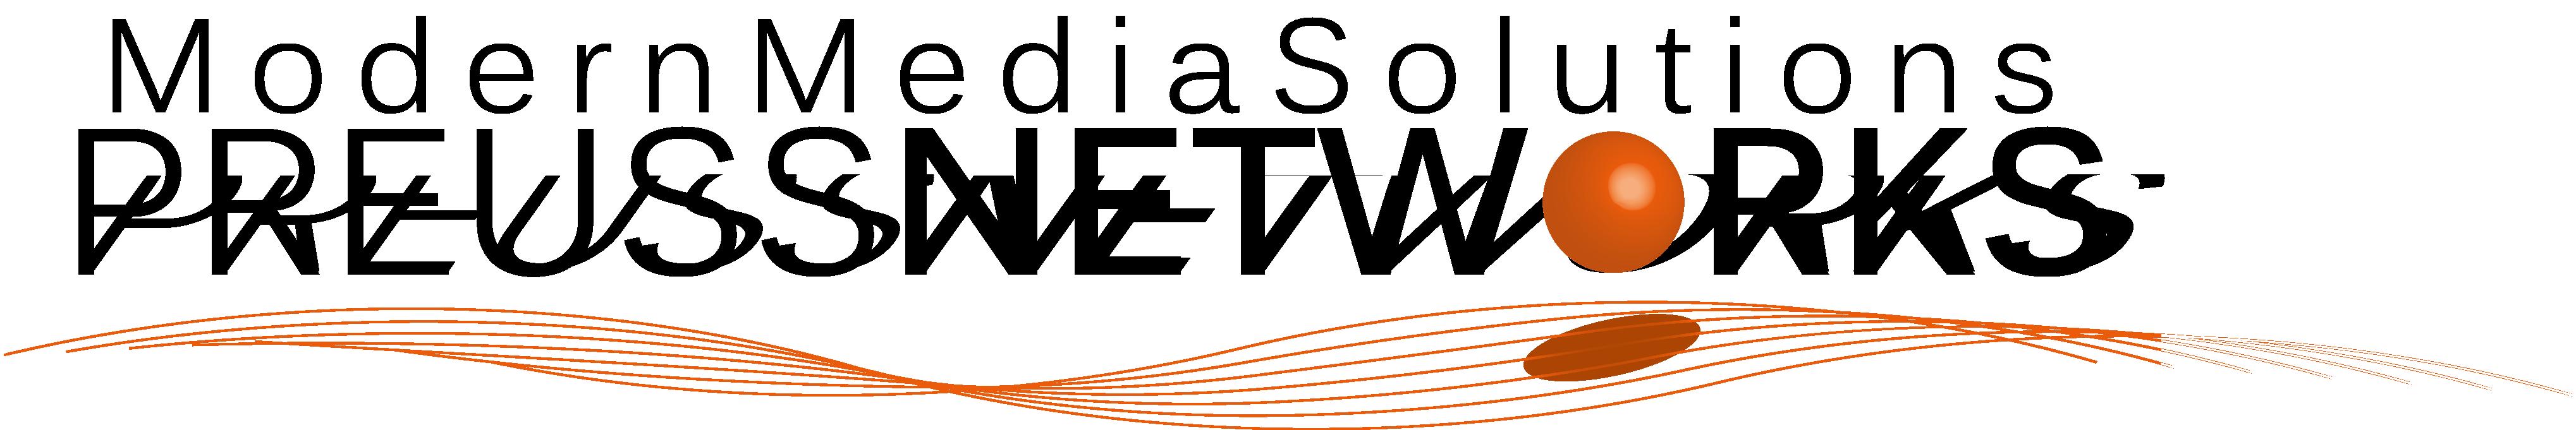 PreussNetworks Logo